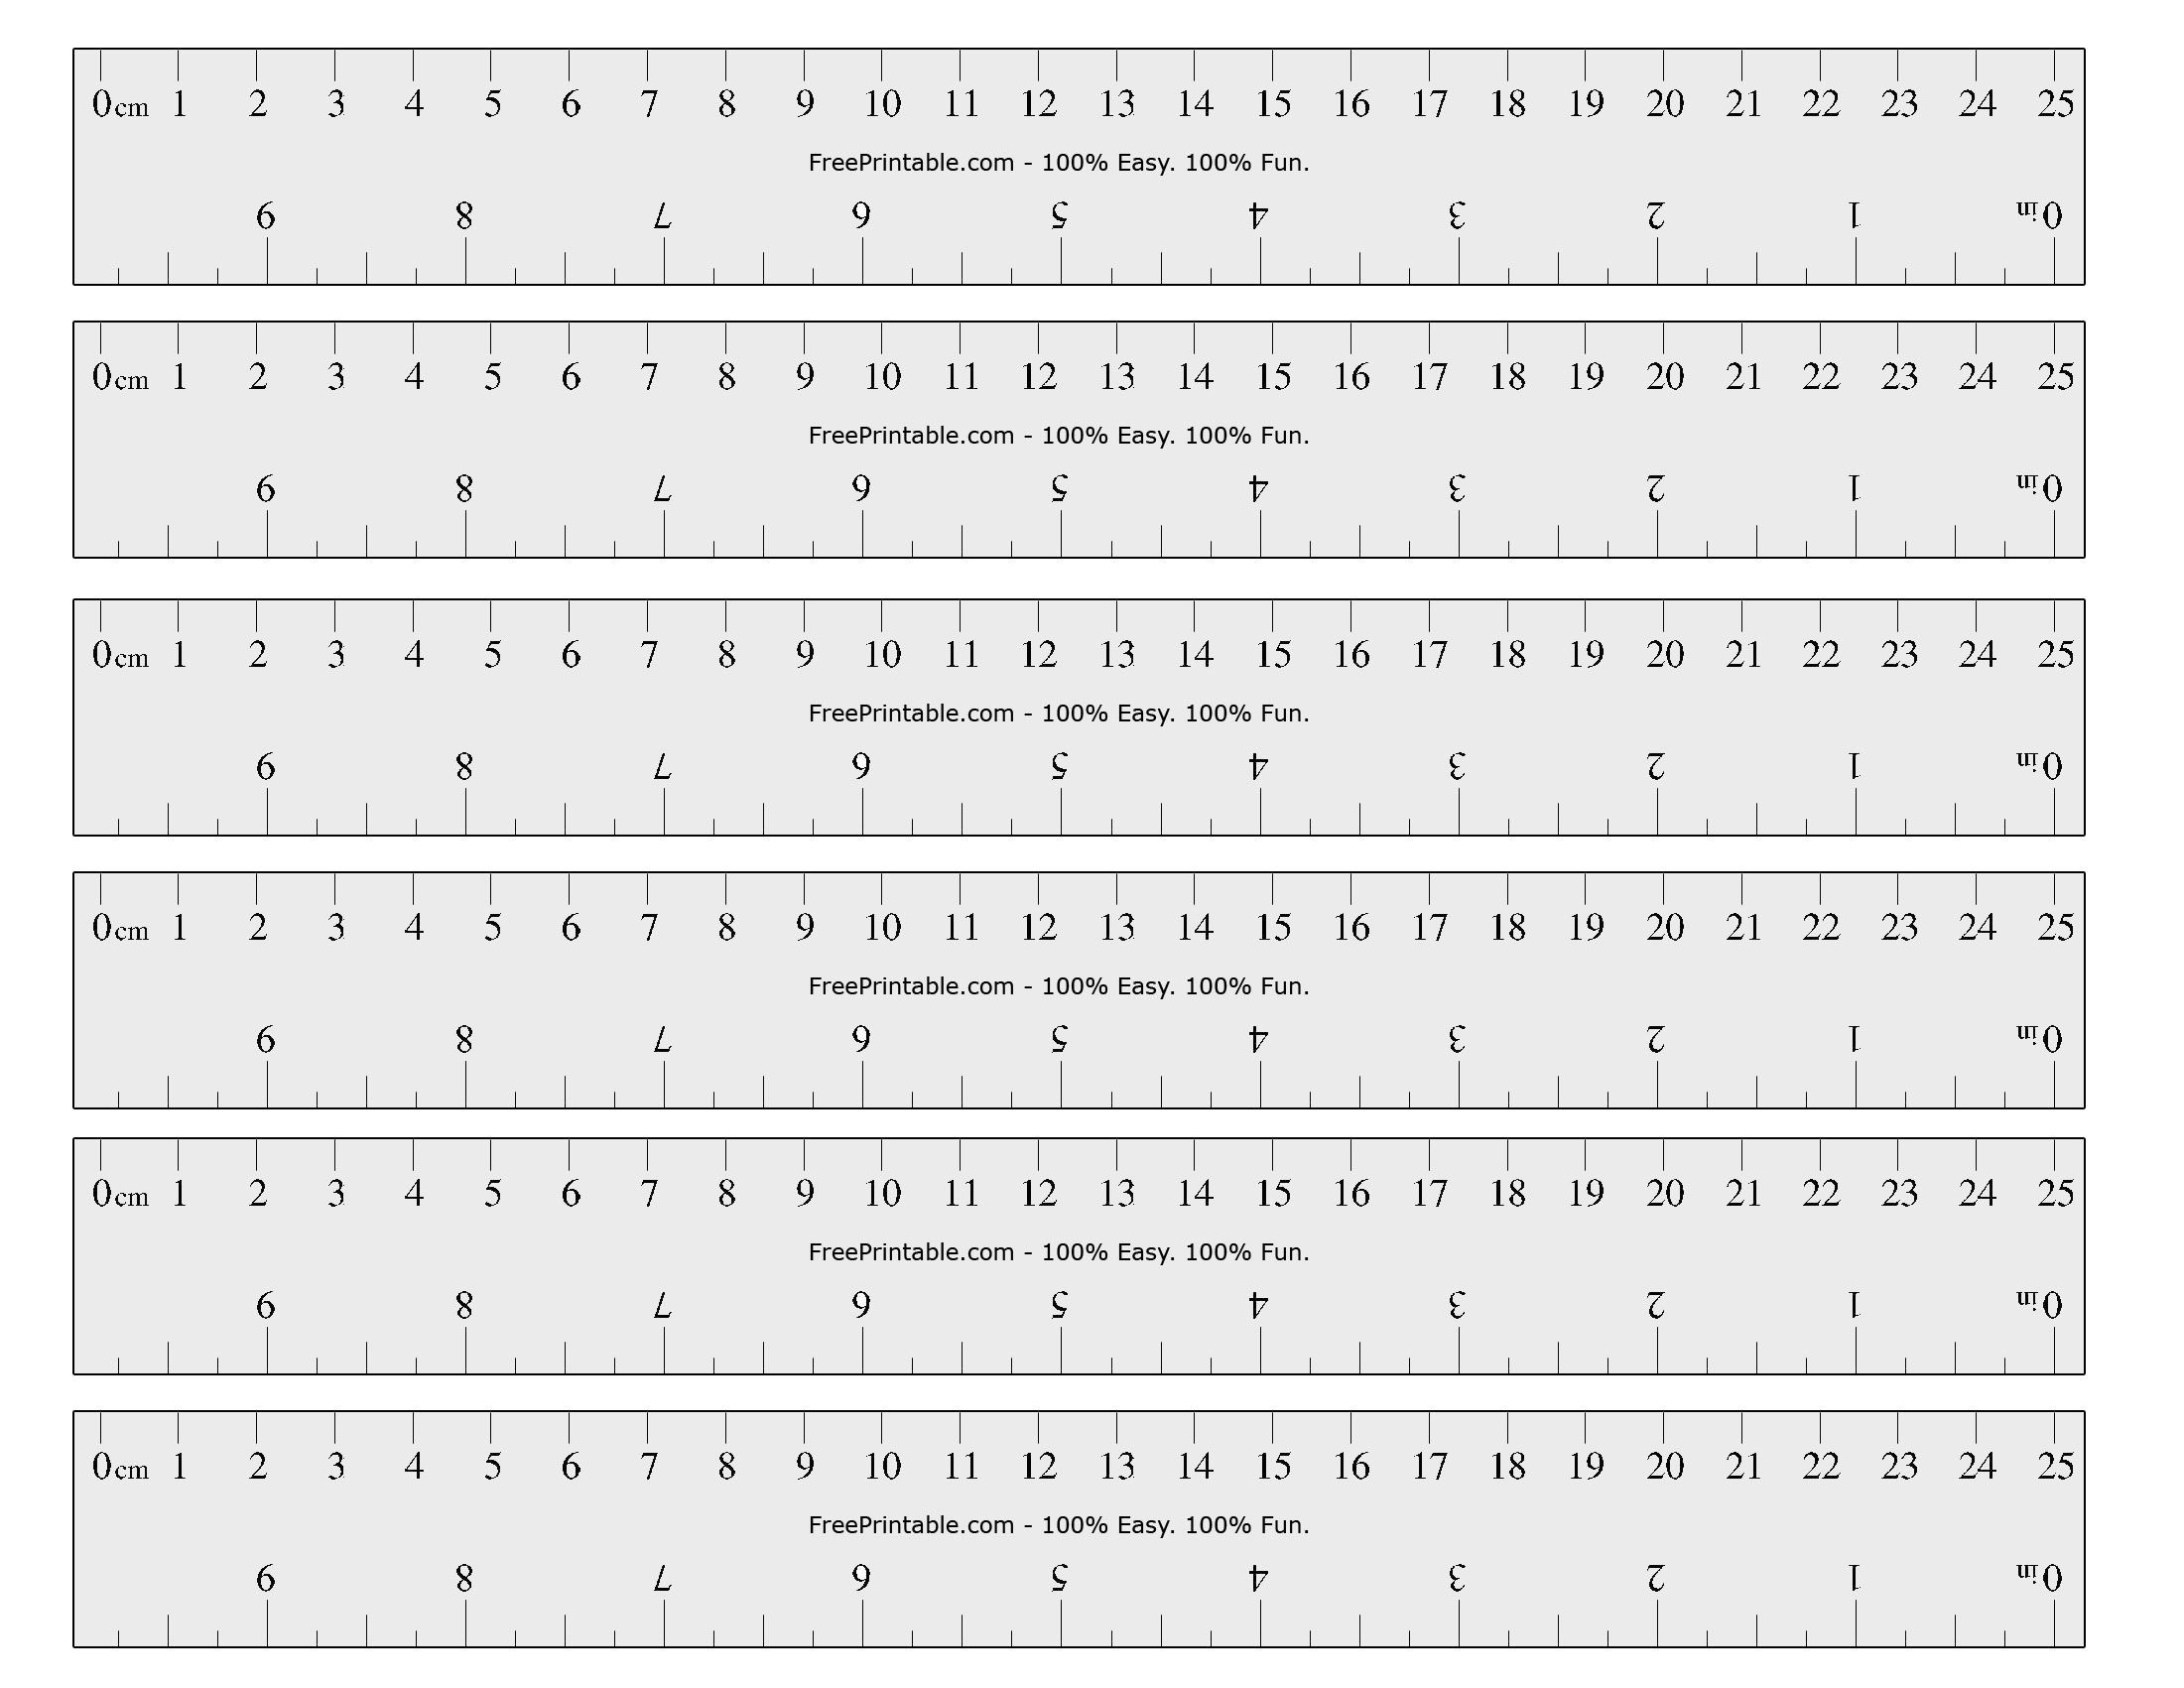 Free Printable Cm/inch Ruler | Math Mania!! - Free Printable Ruler